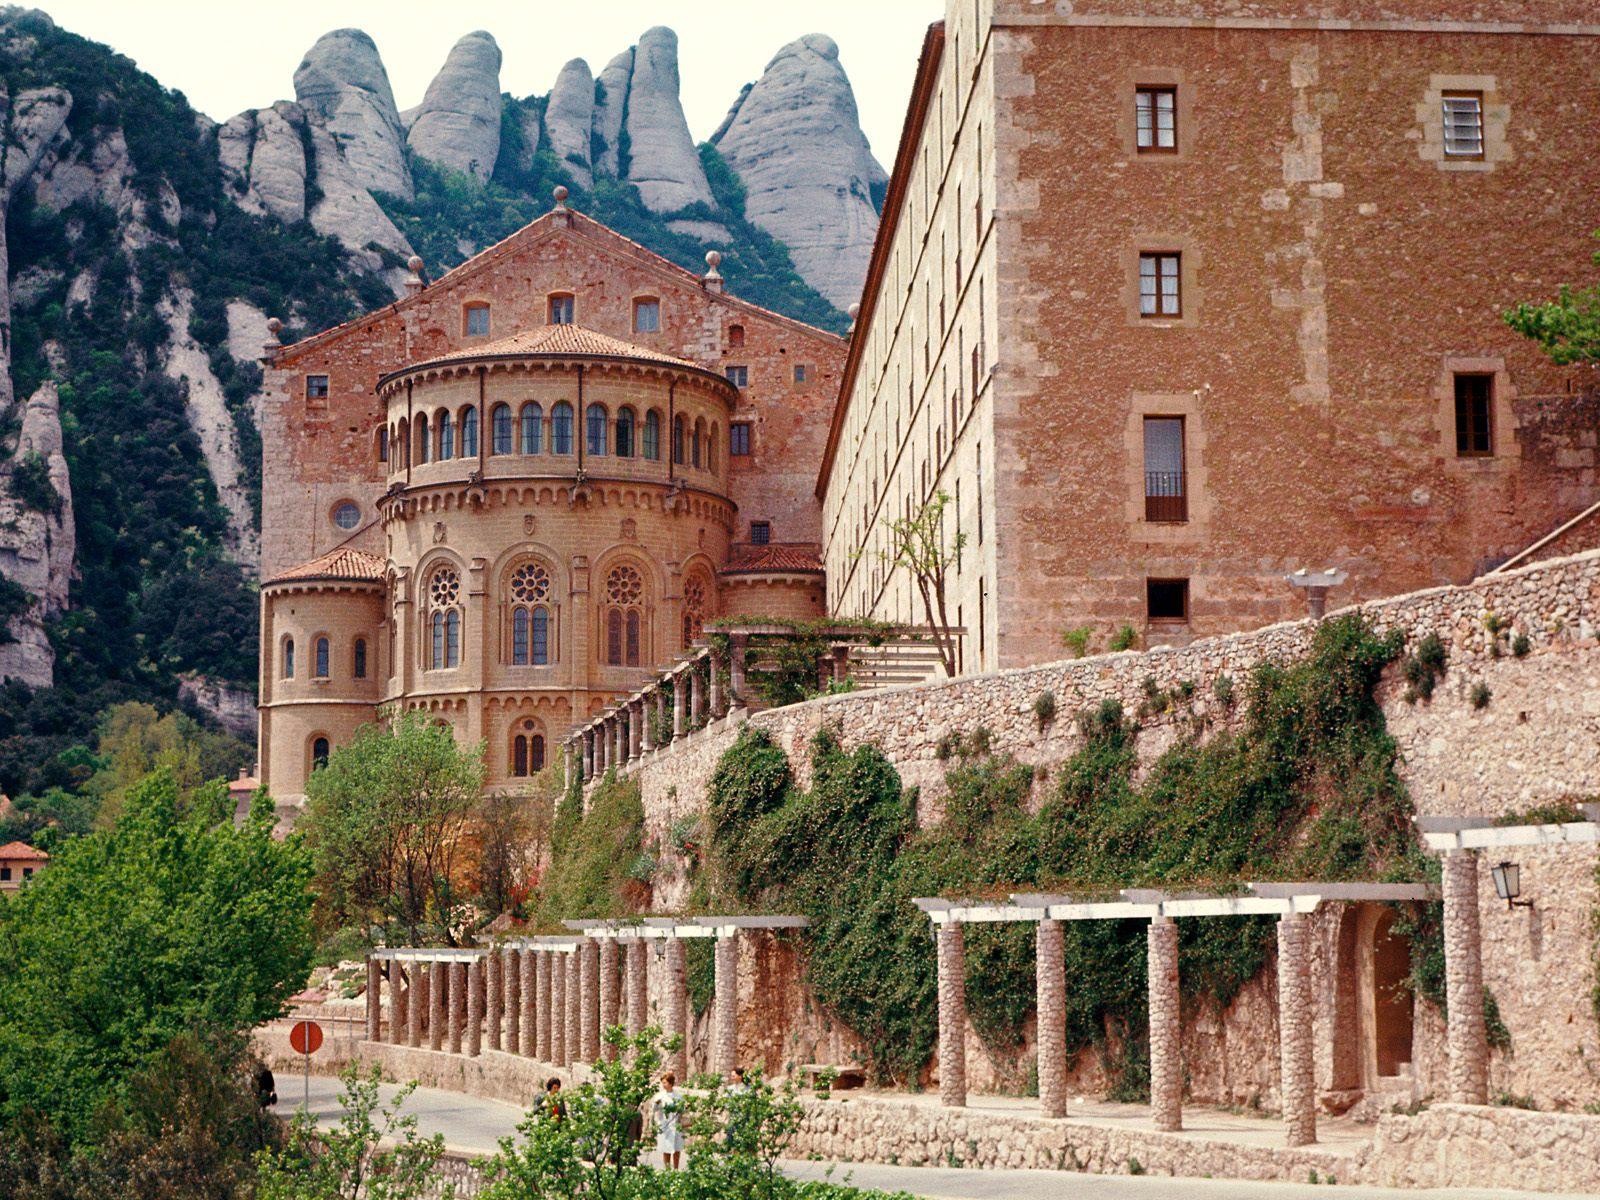 http://1.bp.blogspot.com/-lI-BwmAbiWc/UEF4YjB1FBI/AAAAAAAAOug/as0aN9VAZO0/s1600/spain40-Monastery-of-Montserrat.jpg